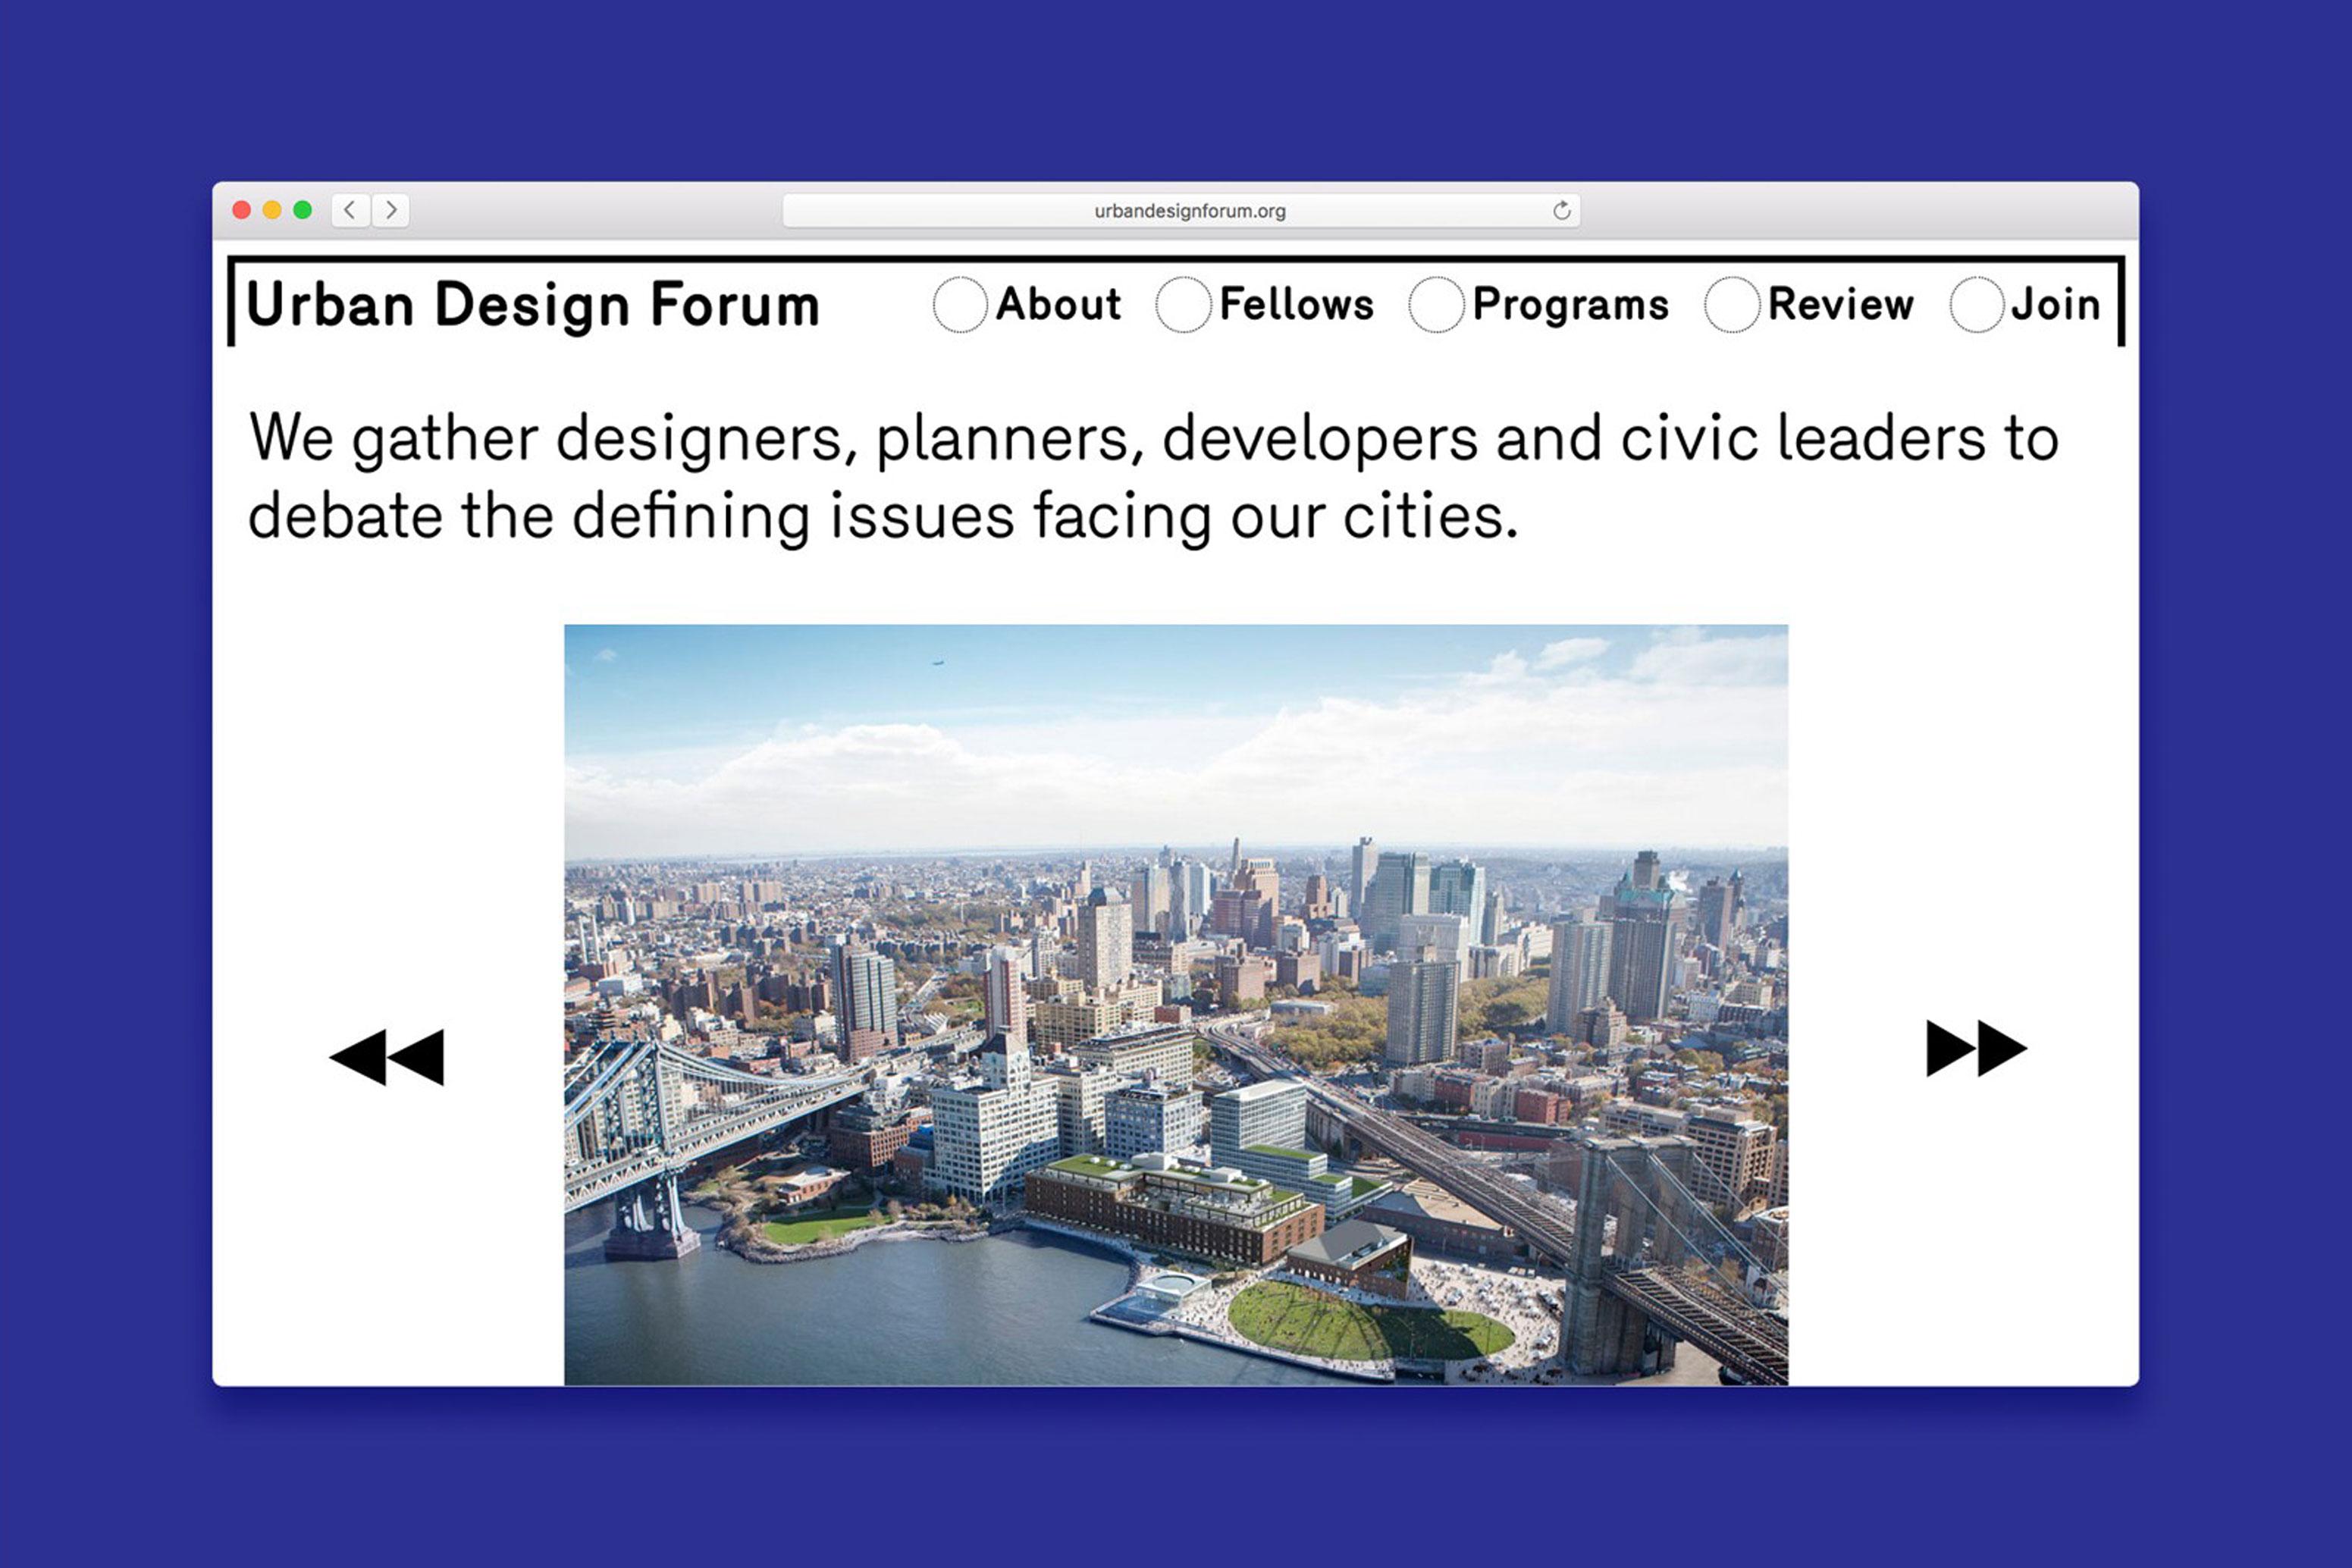 Urban Design Forum Website